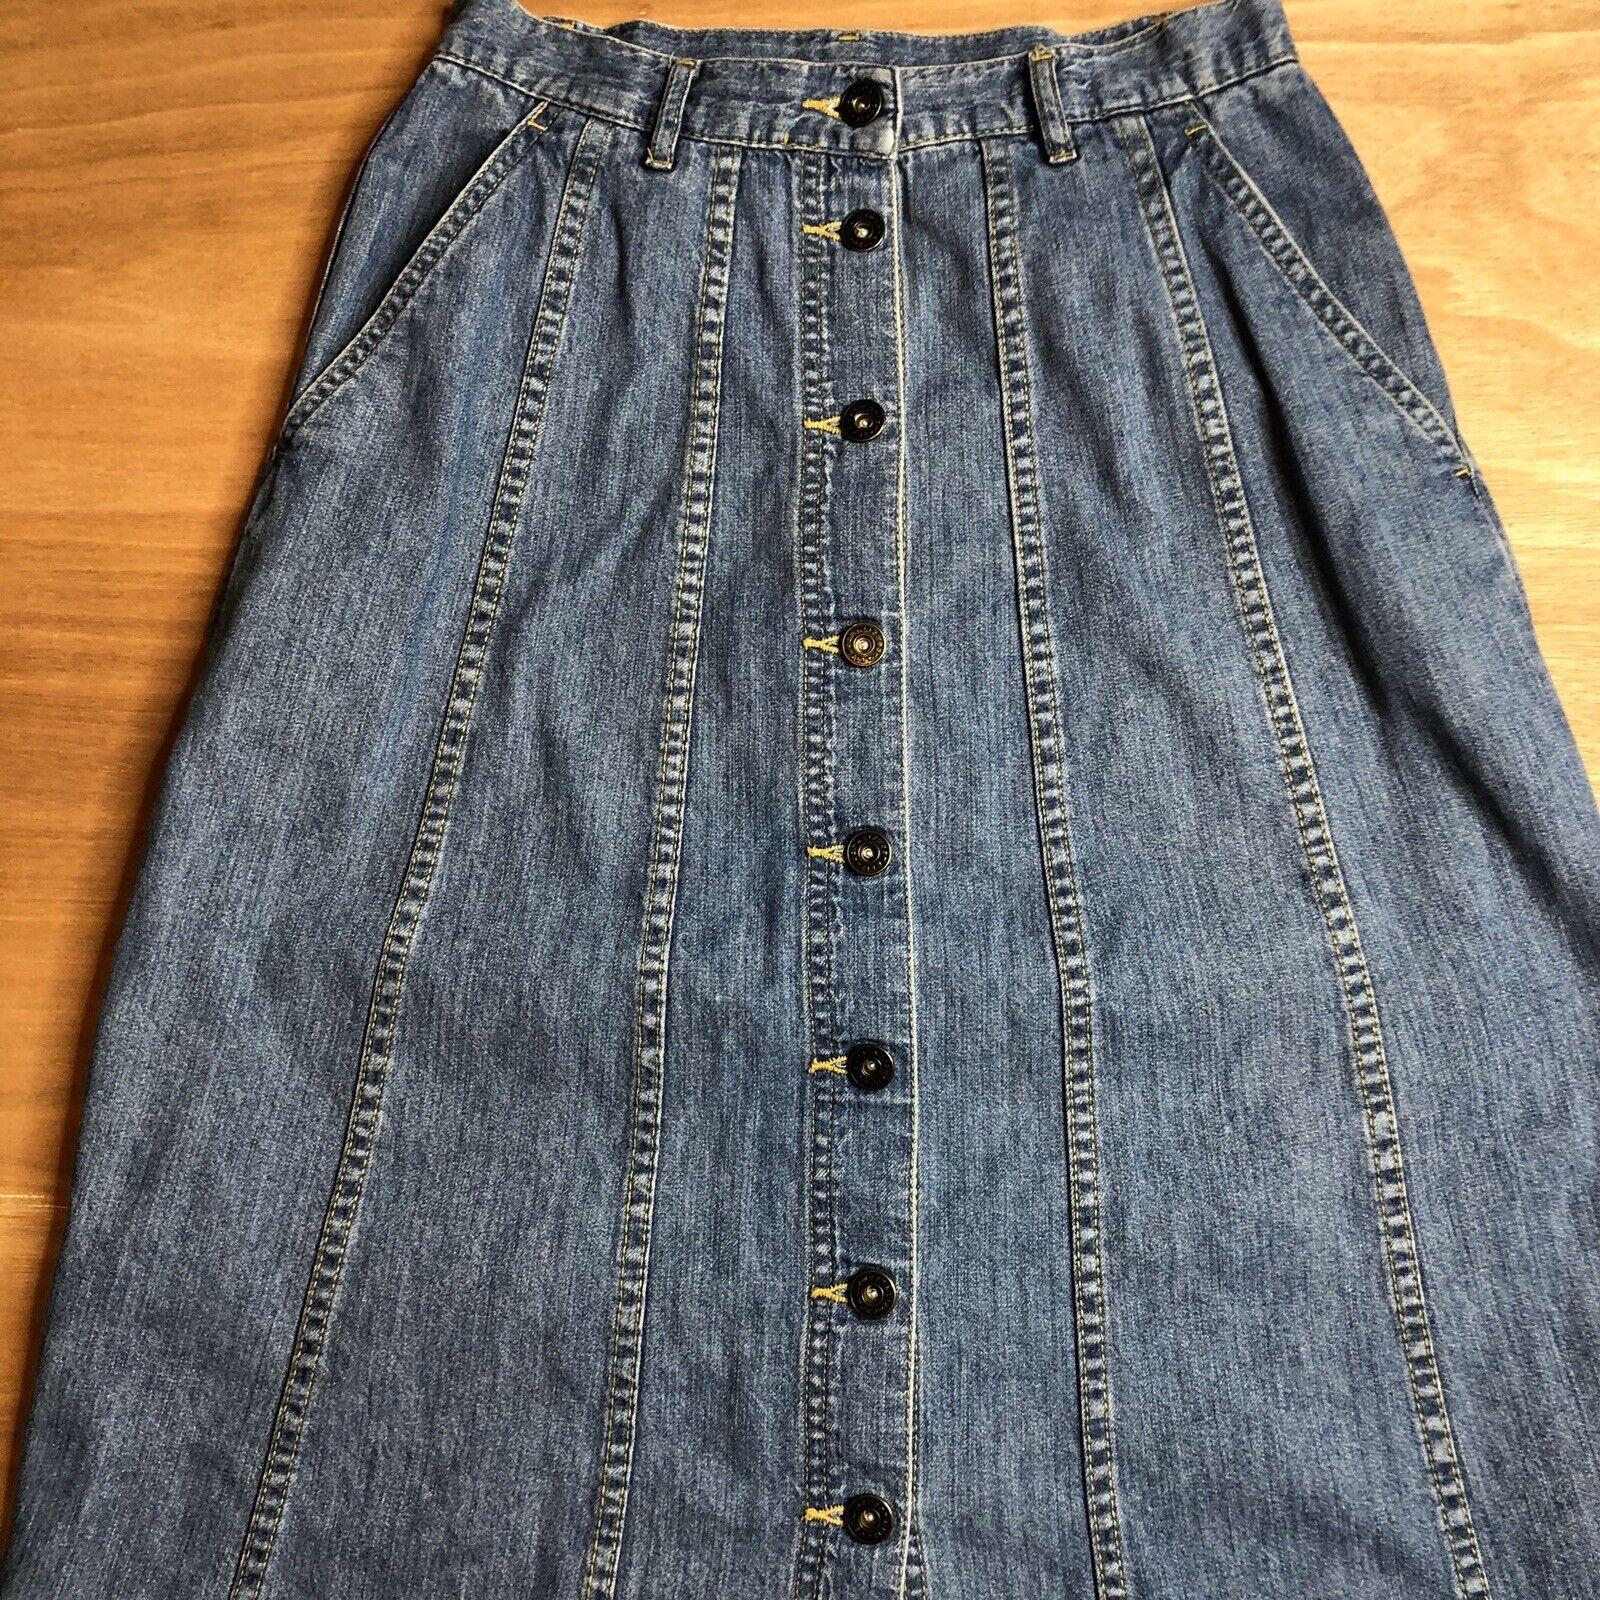 Vintage Lizwear Women's Petite Size 6 Denim Butto… - image 2